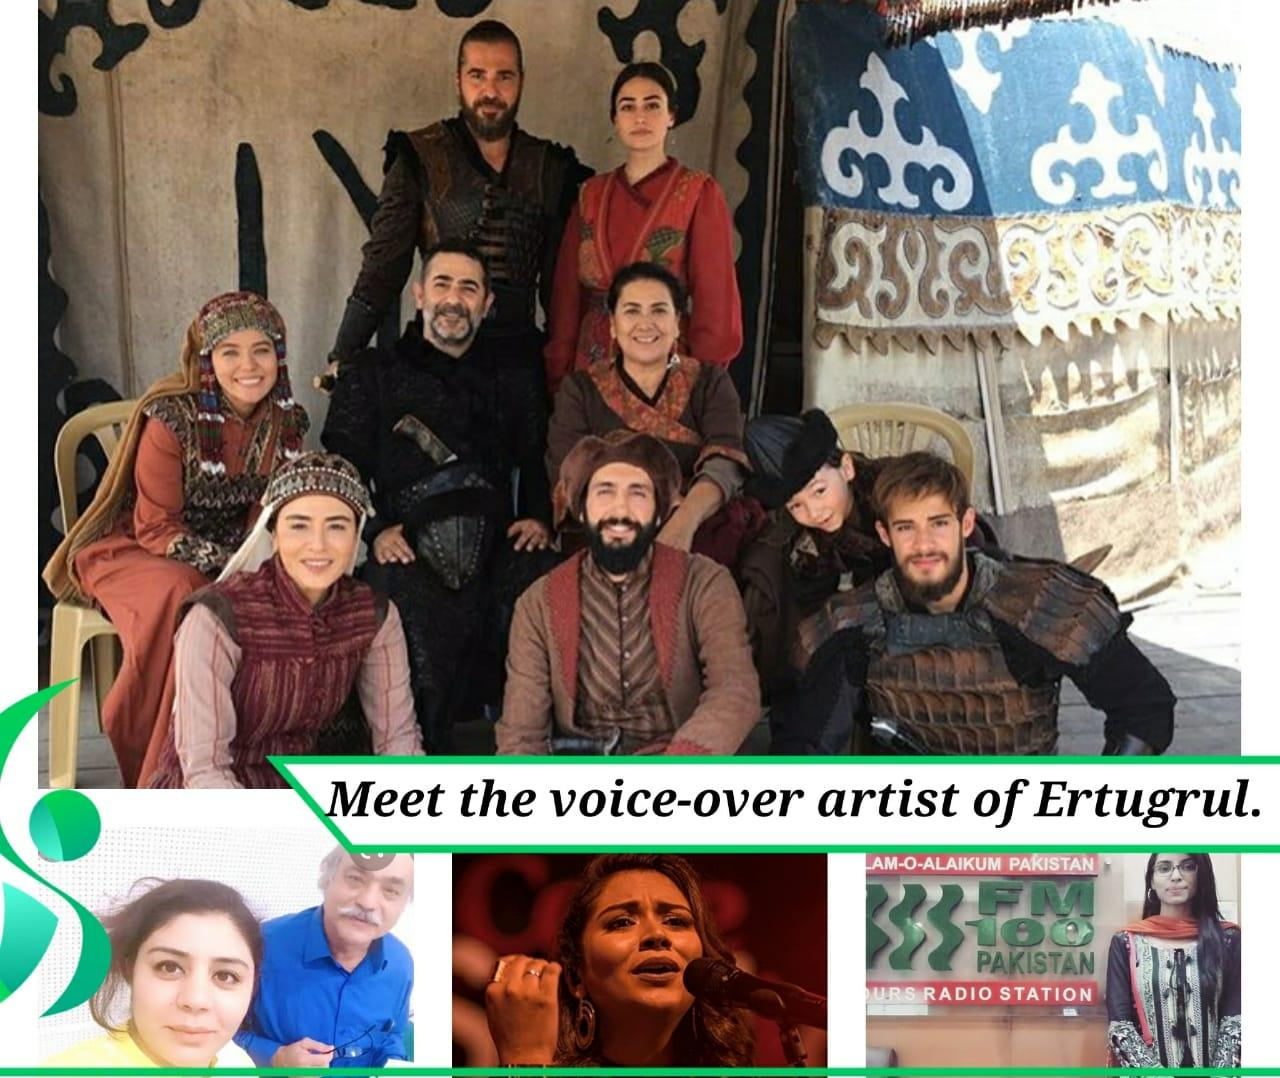 Meet the voice-over artist behind Ertugrul.